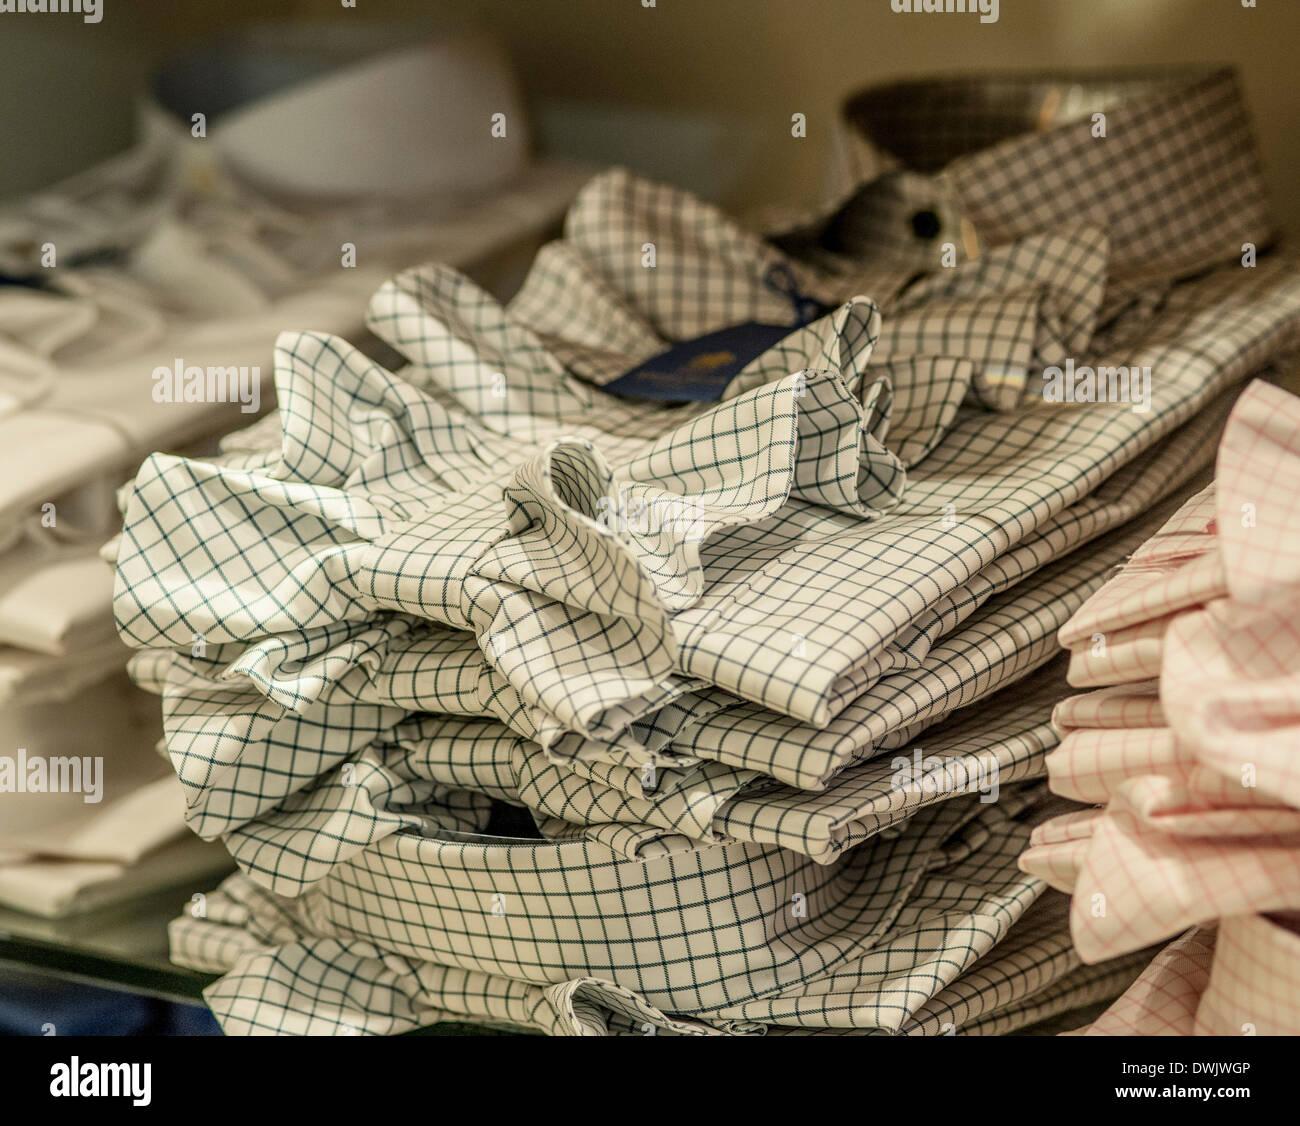 5955ad60d97 Grosvenor shirts 18-19 Jermyn Street